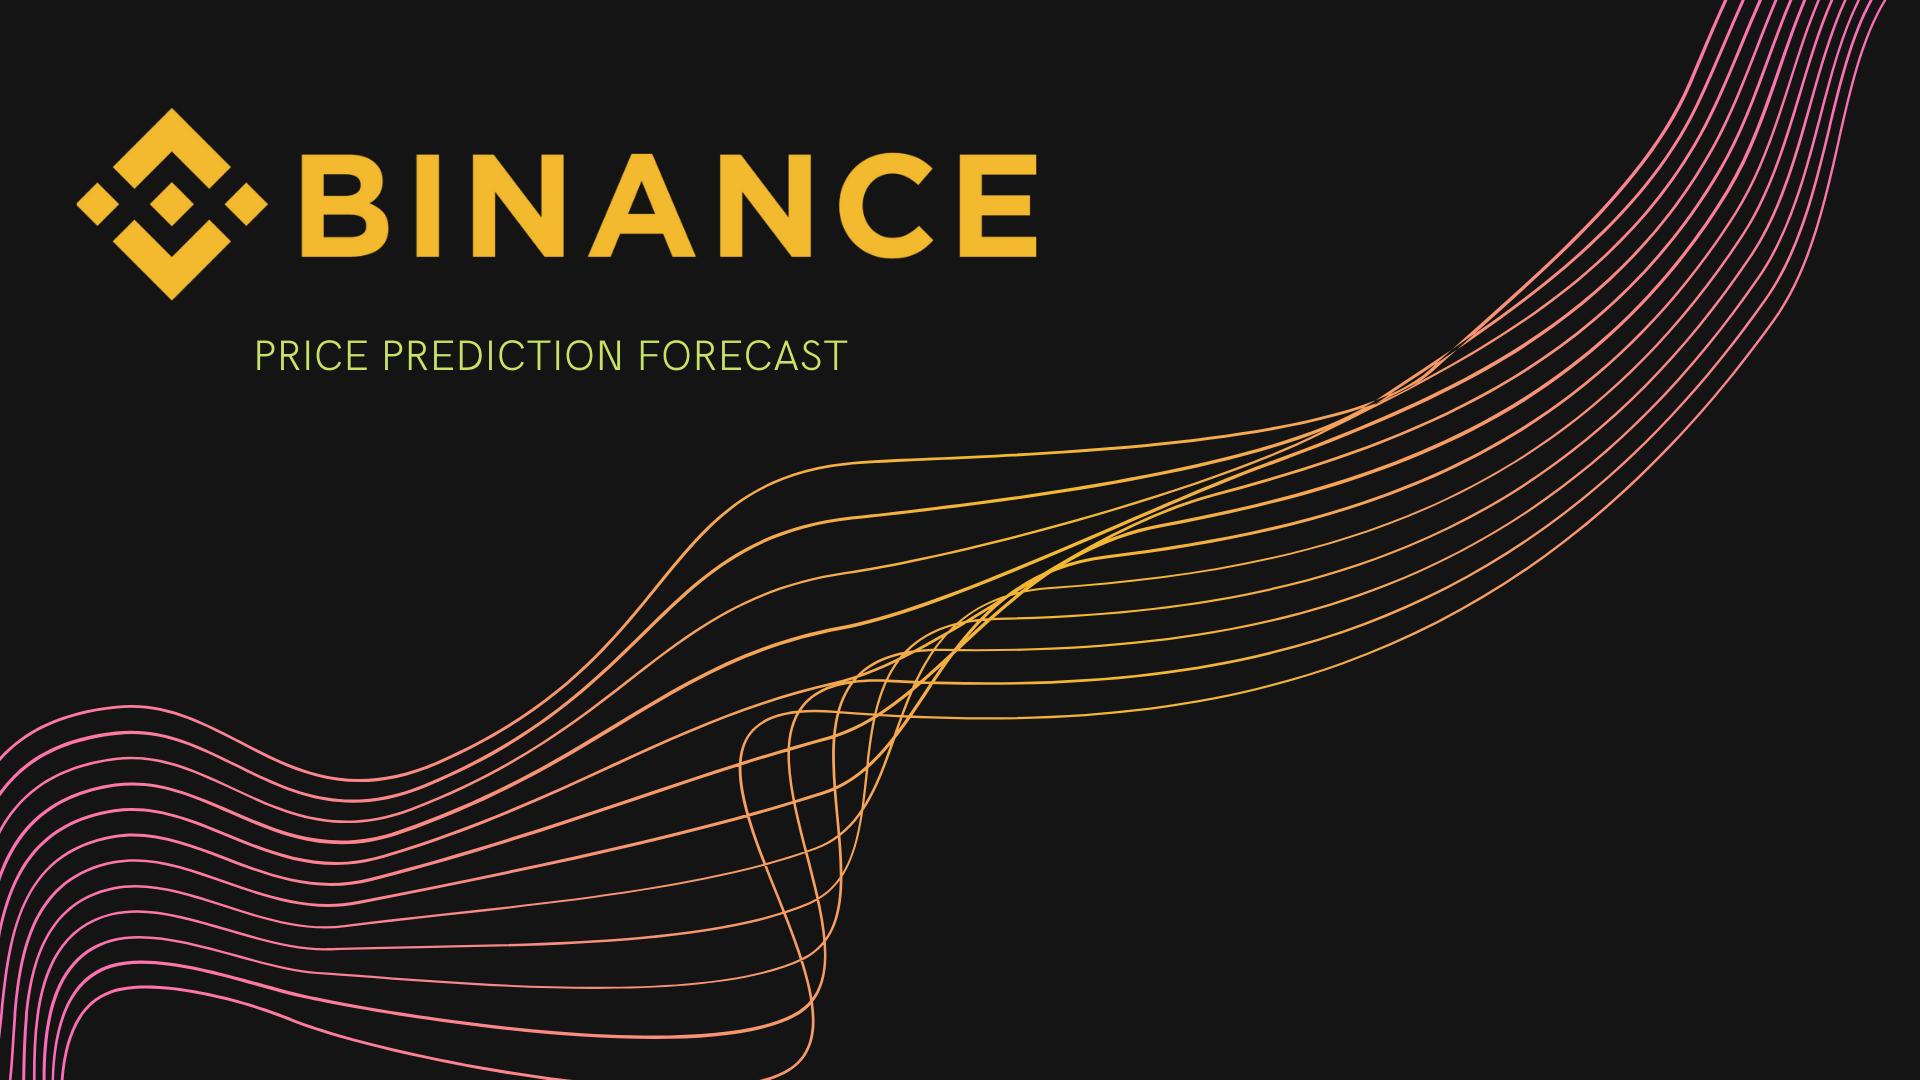 BInance Coin Forecast